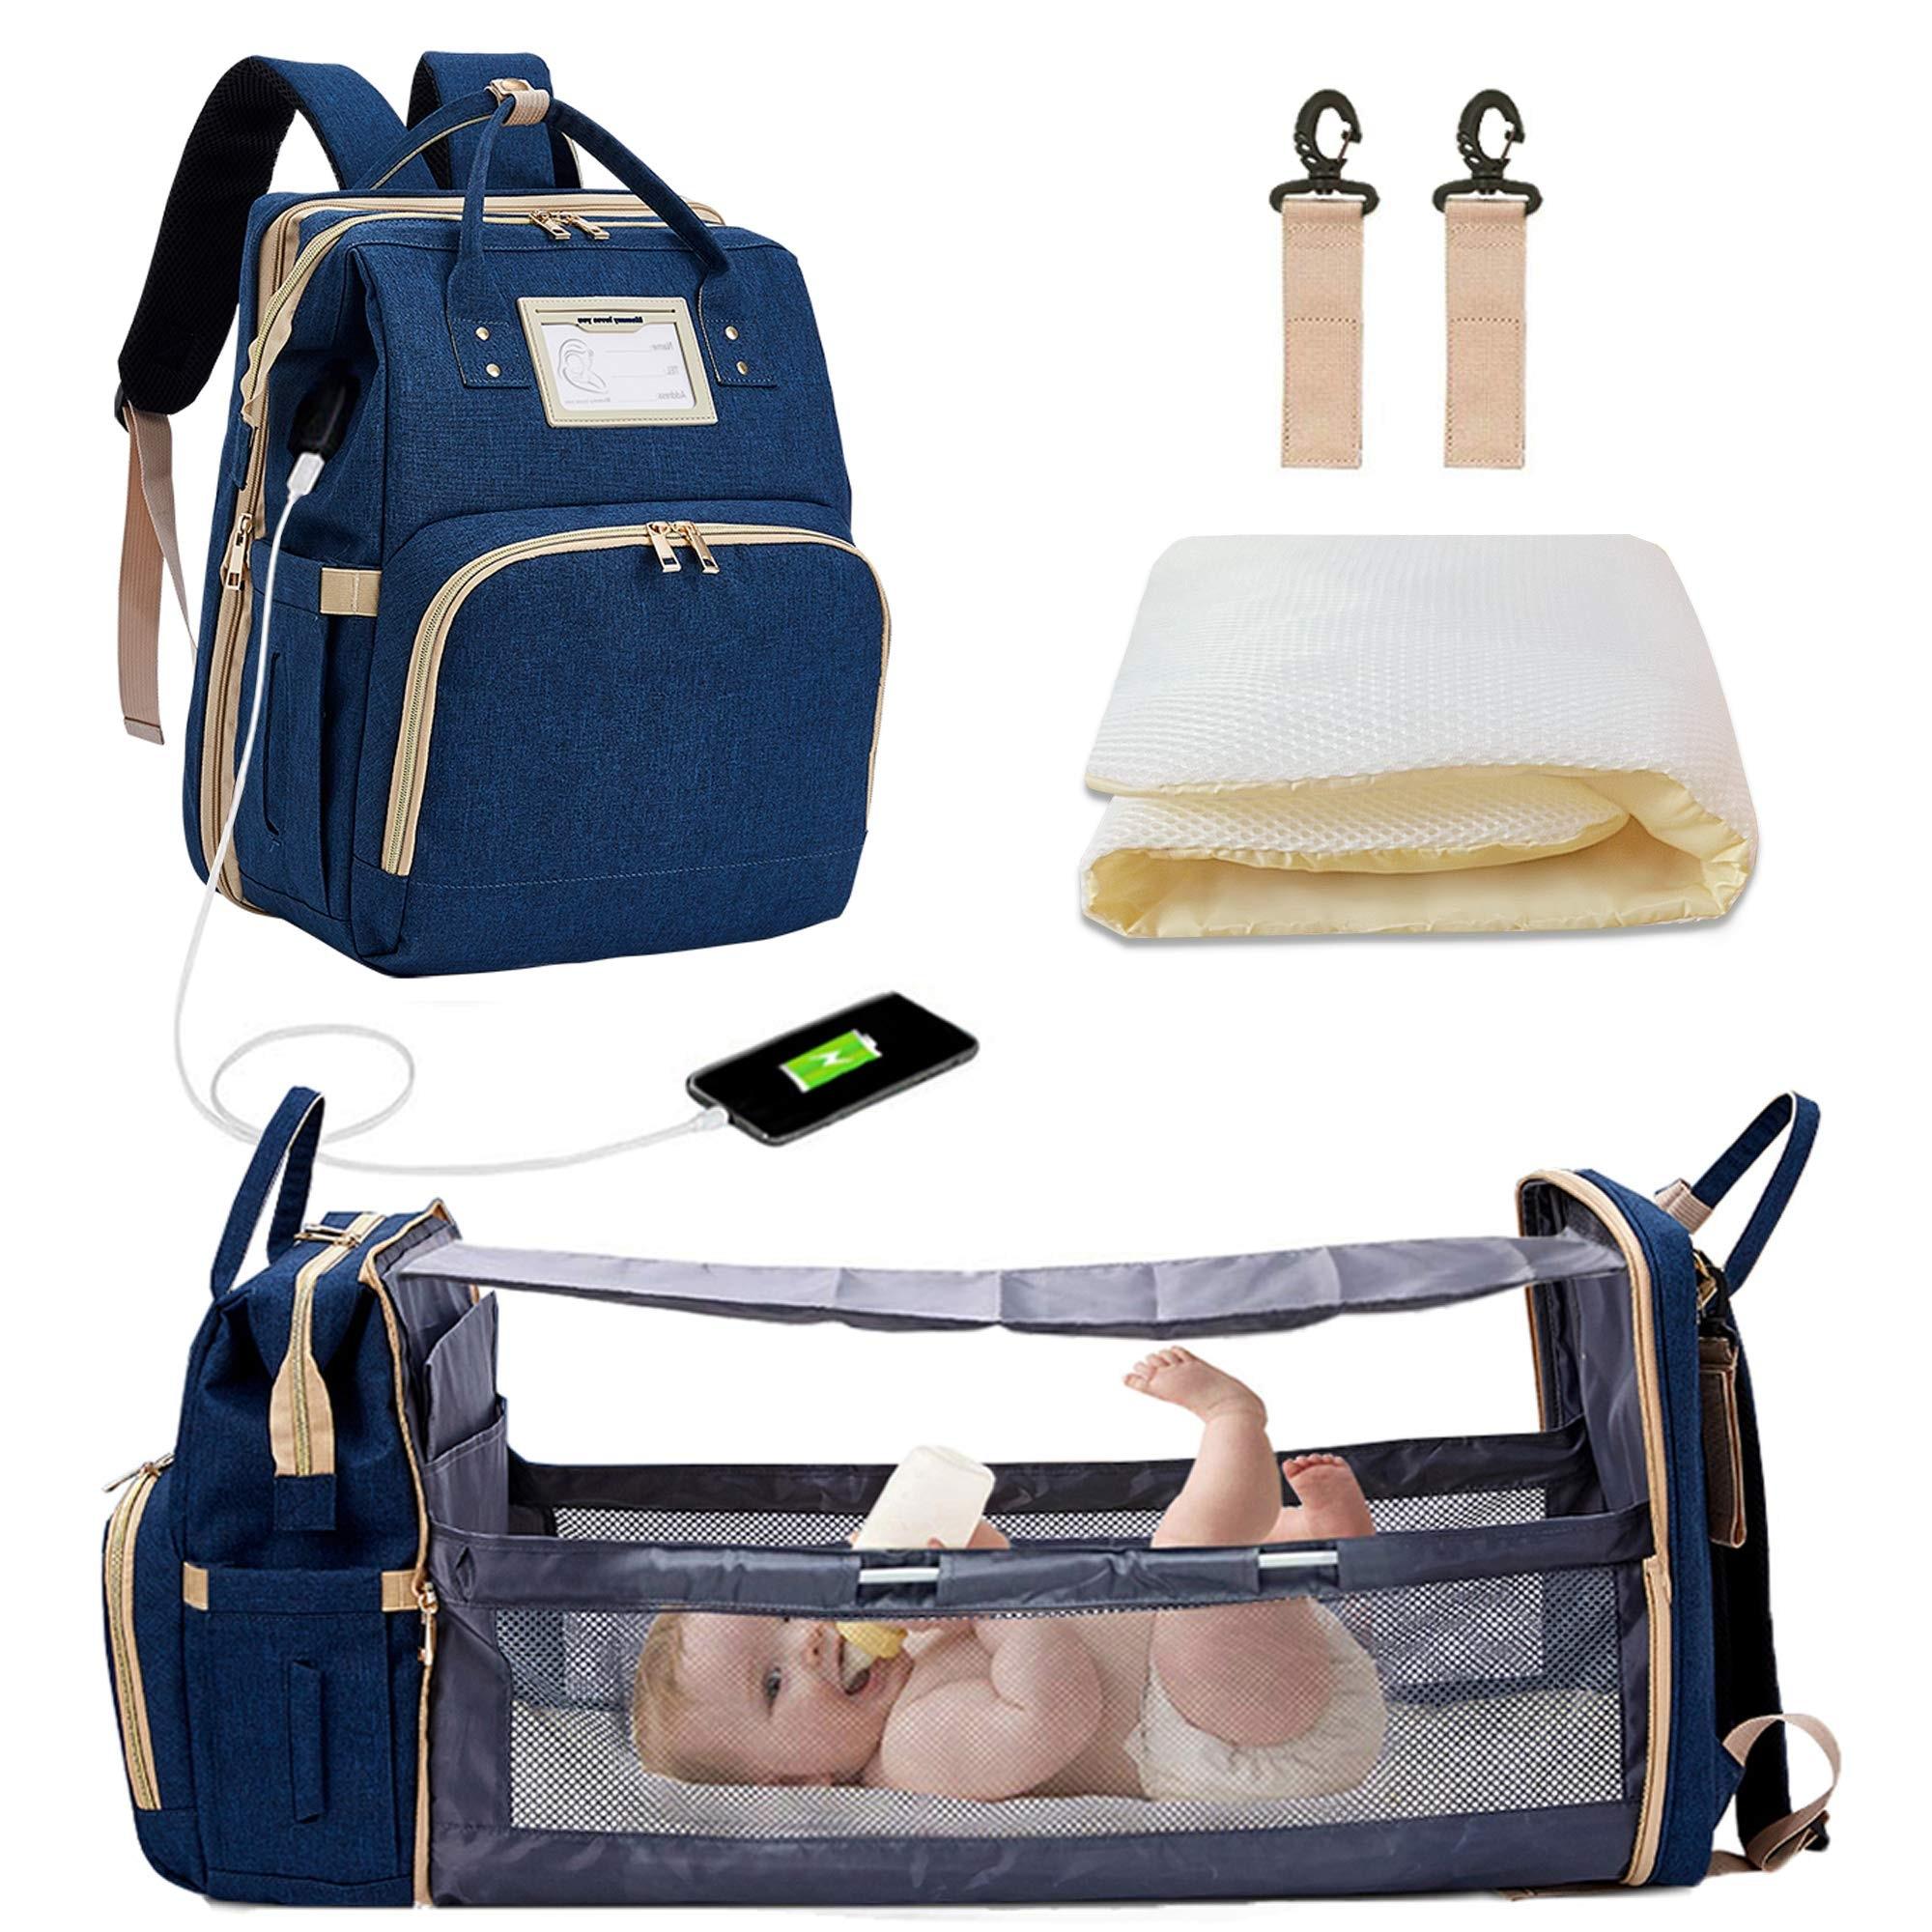 Diaper Bag Backpack For Mom Portable Crib  Mummy Maternity Nappy Baby Bag Travel Backpack Designer Nursing Bag For Baby Care